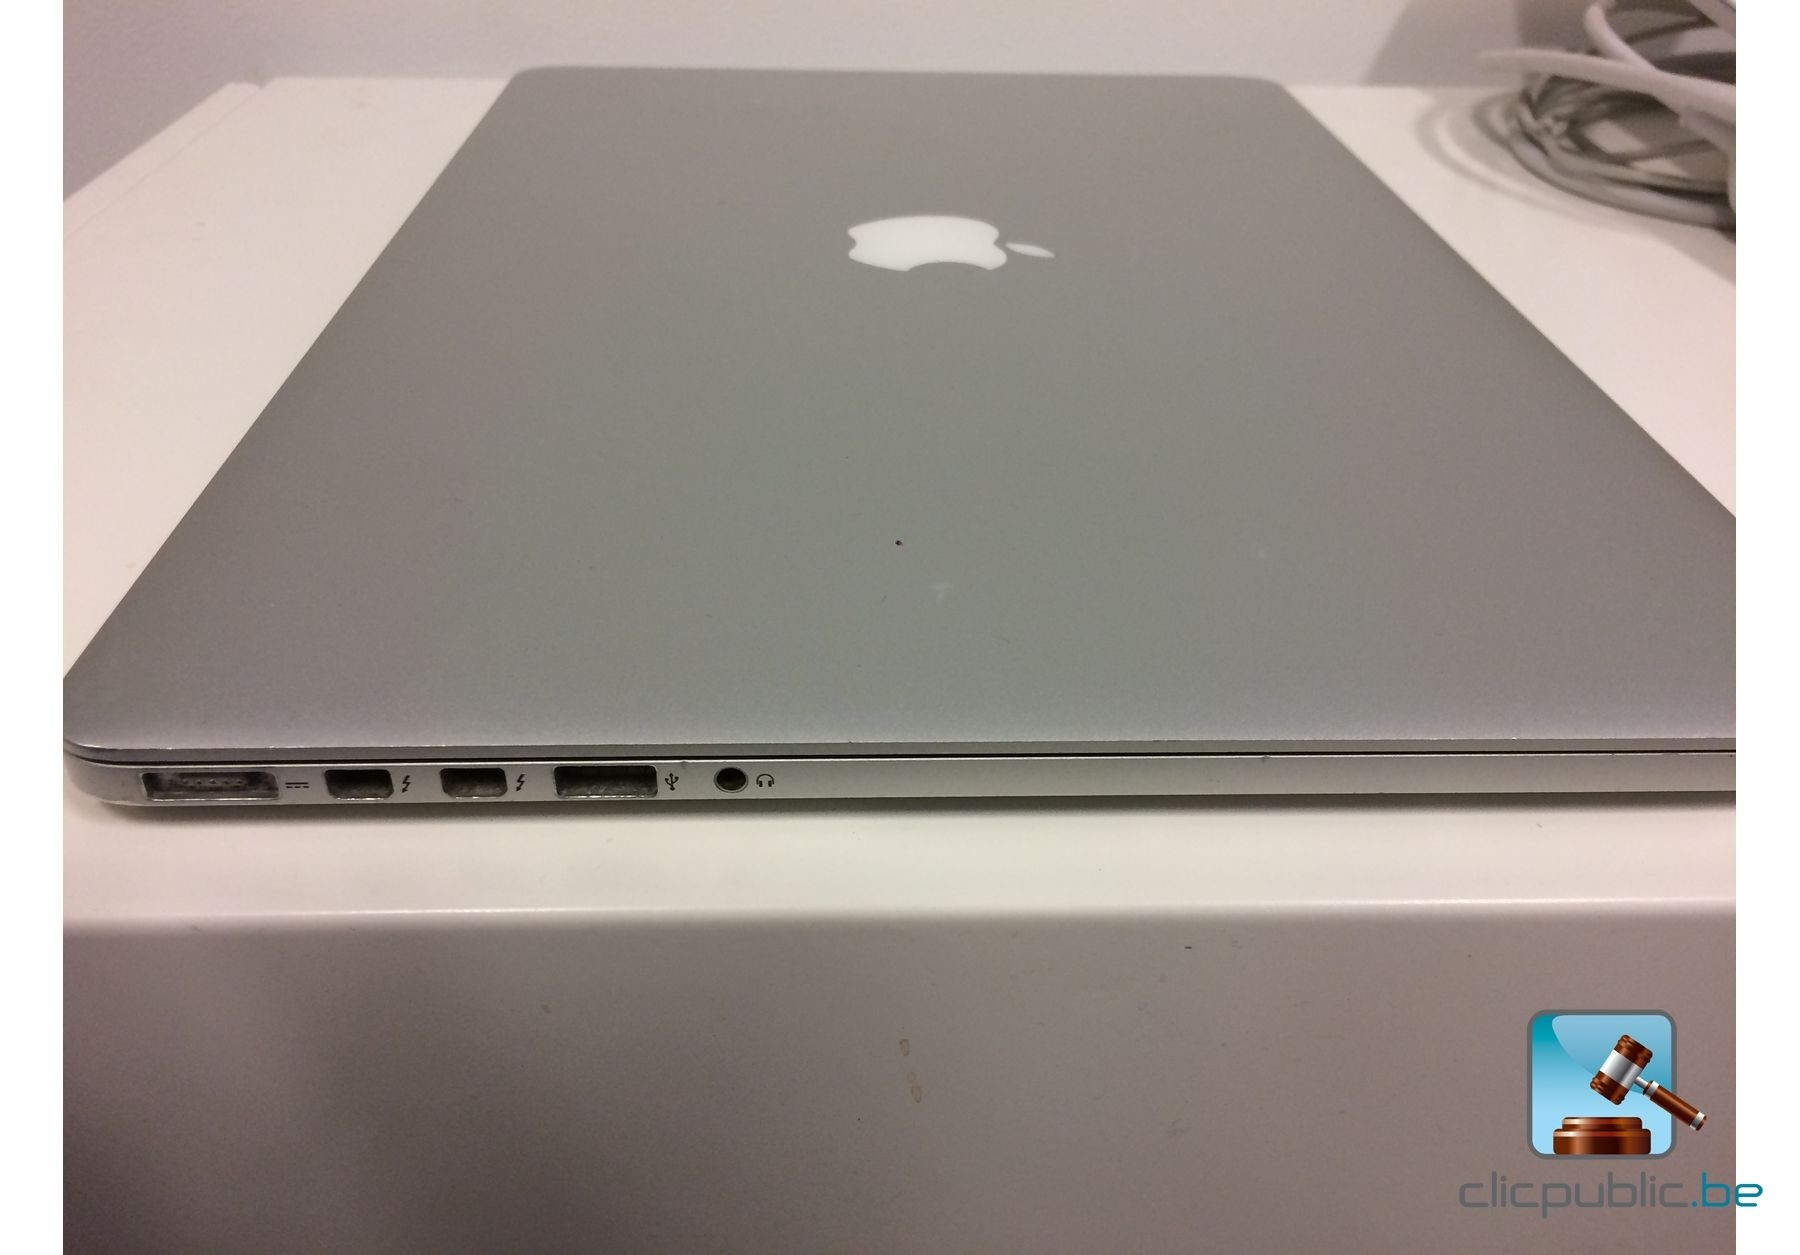 ordinateur portable apple macbook pro retina mi 2012. Black Bedroom Furniture Sets. Home Design Ideas